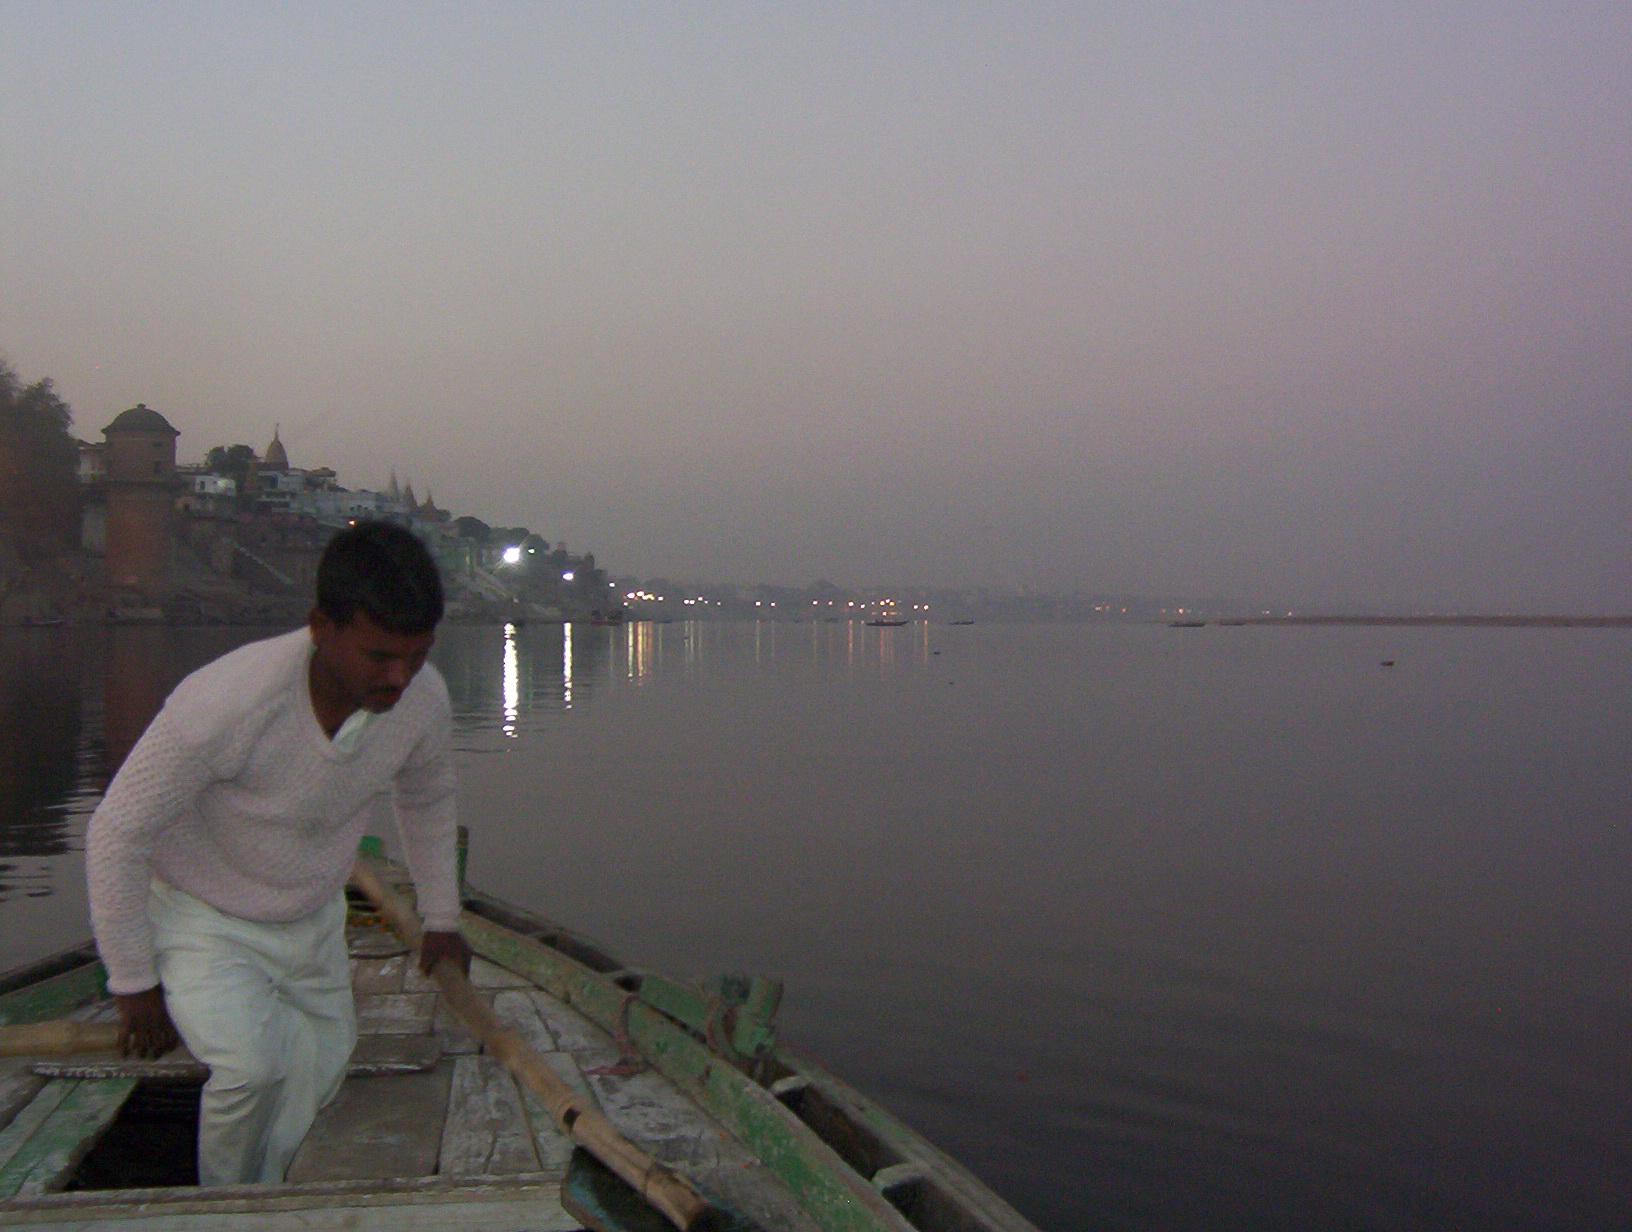 On the Ganga at twilight